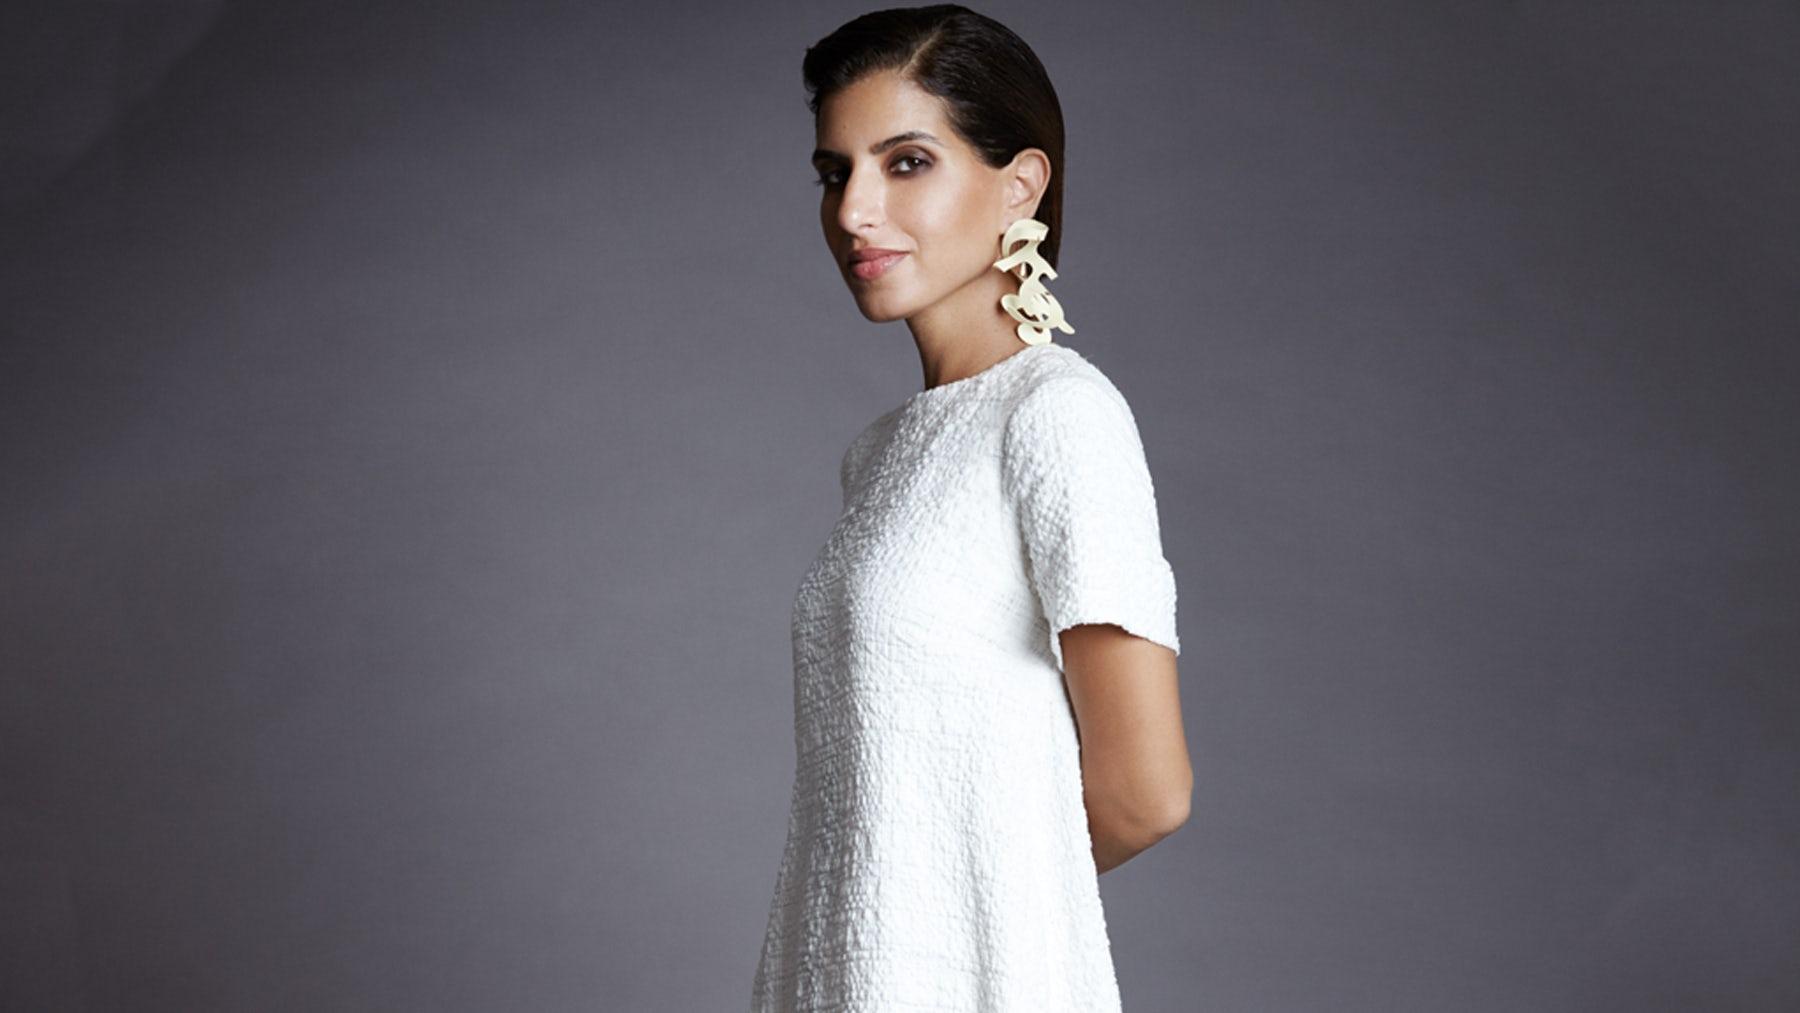 Condé Nast to Launch Vogue Arabia